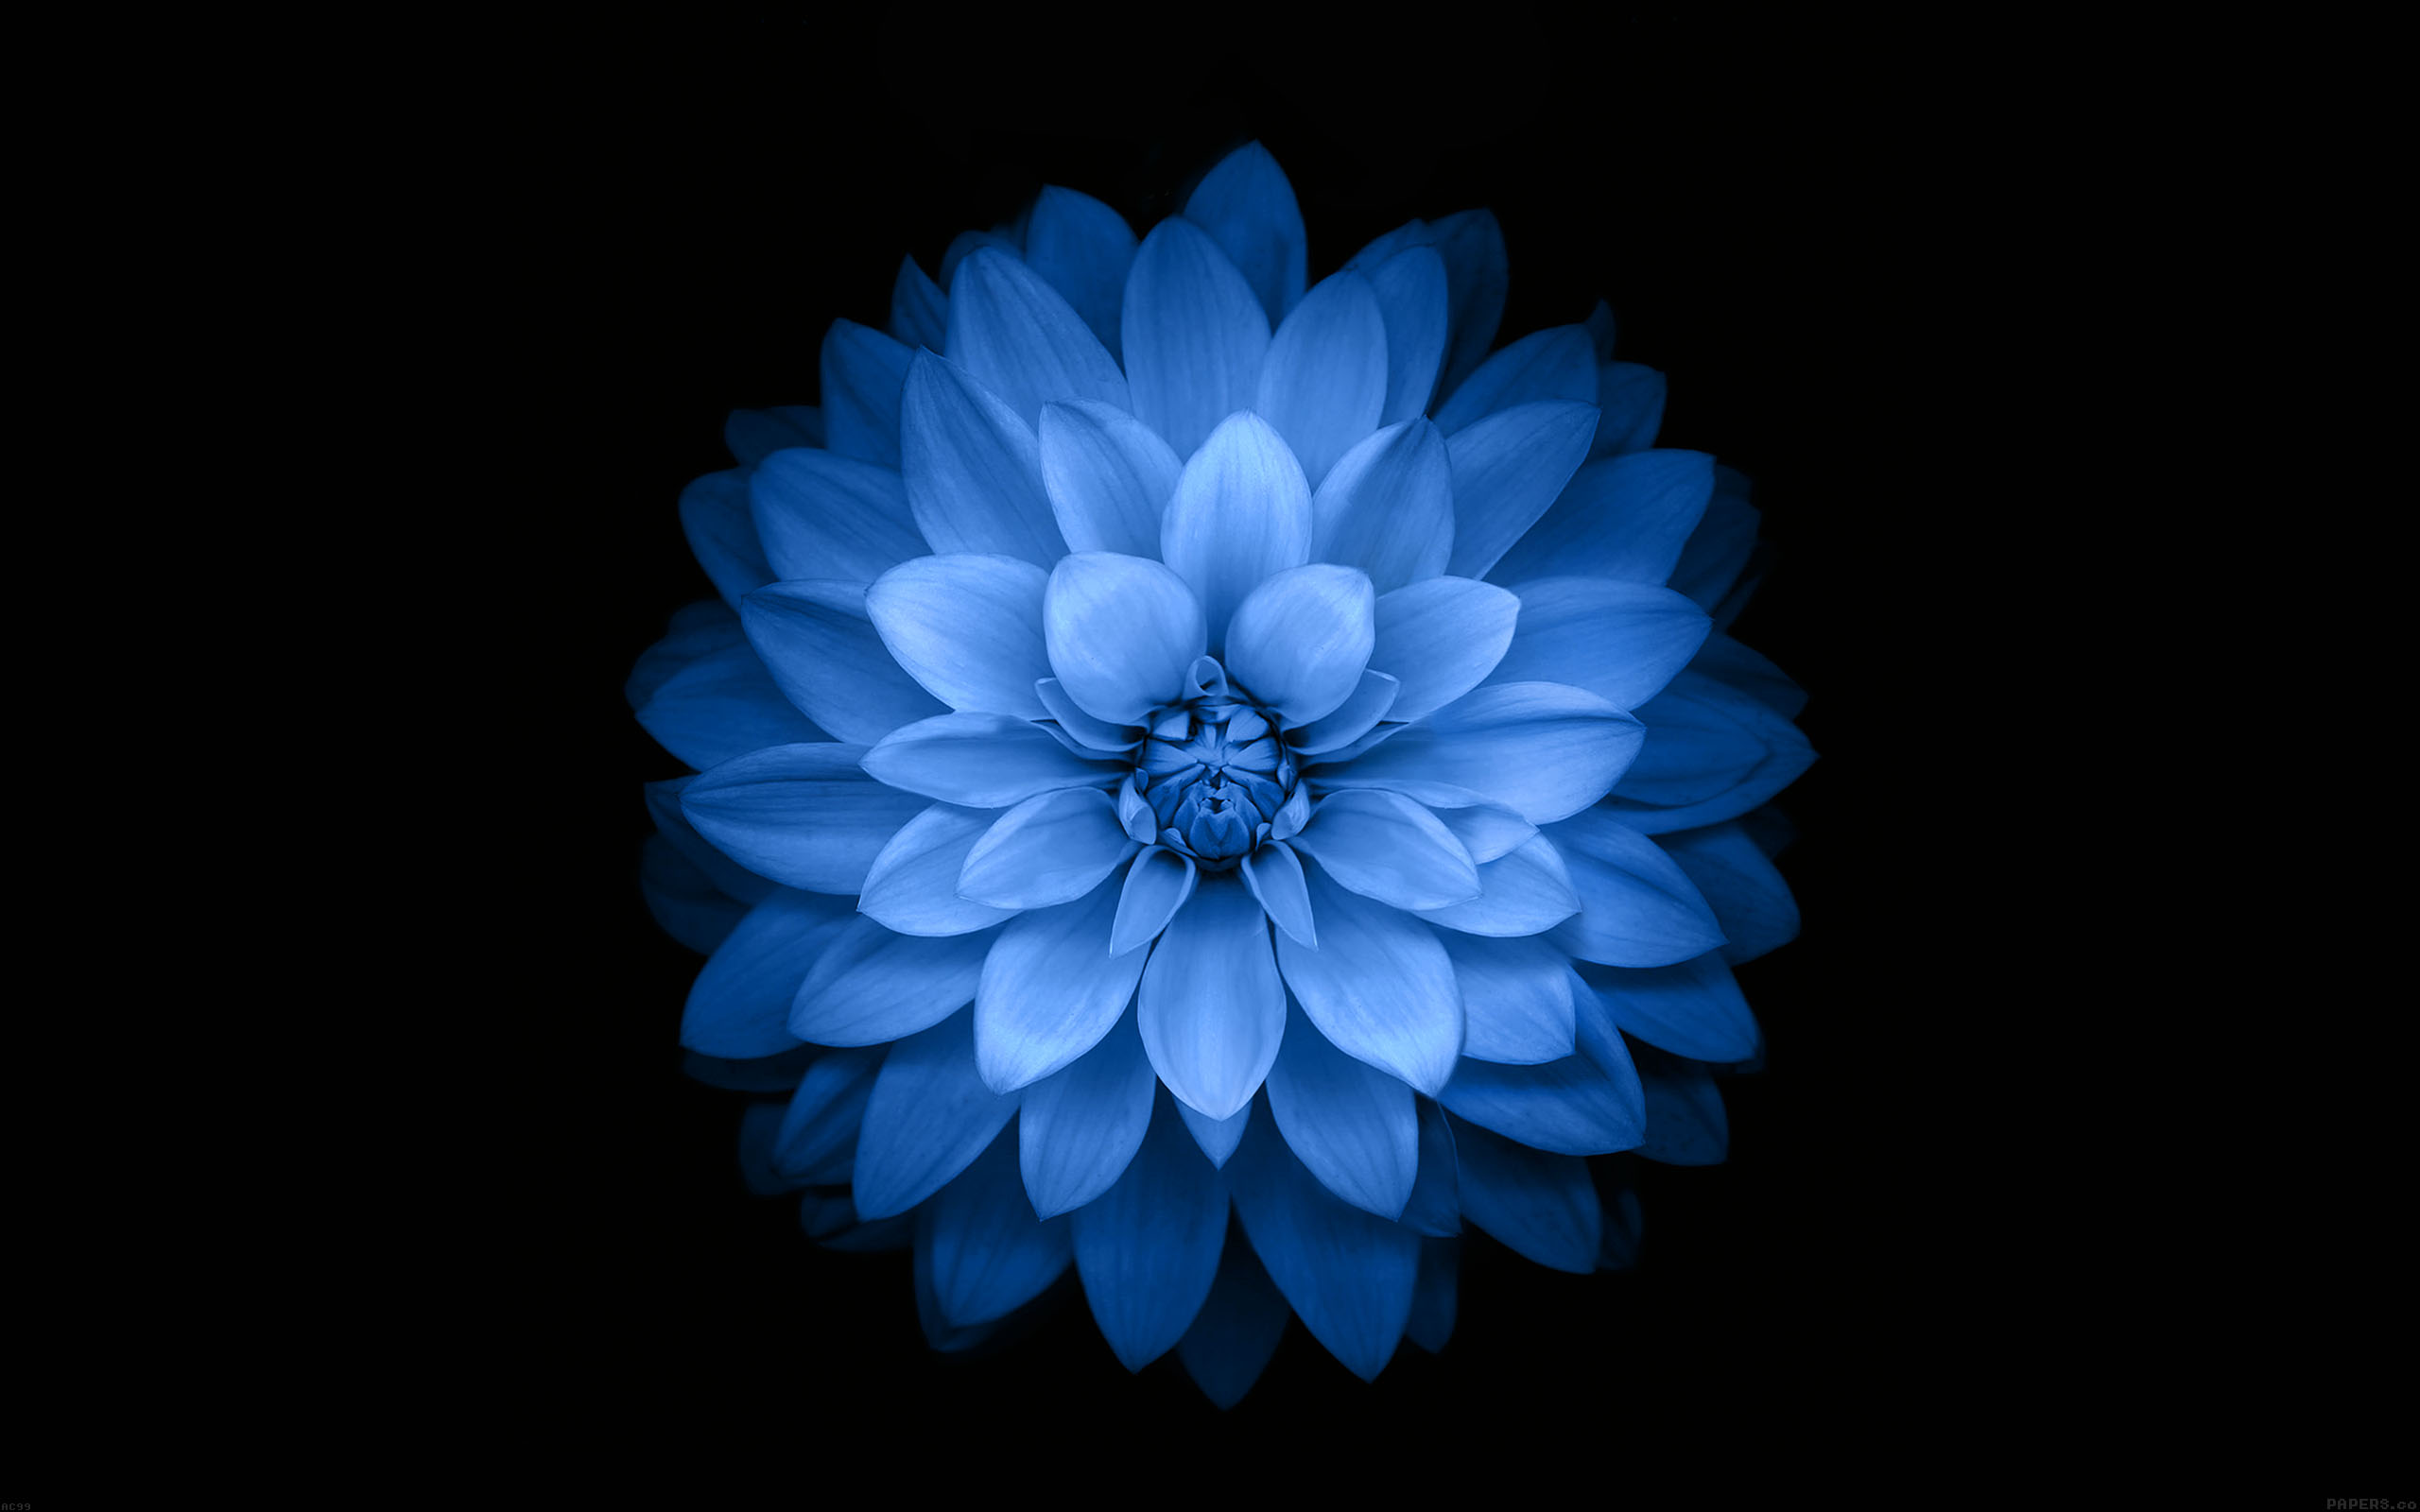 Cute Anime Wallpaper For Phone Ac99 Wallpaper Apple Blue Lotus Iphone6 Plus Ios8 Flower